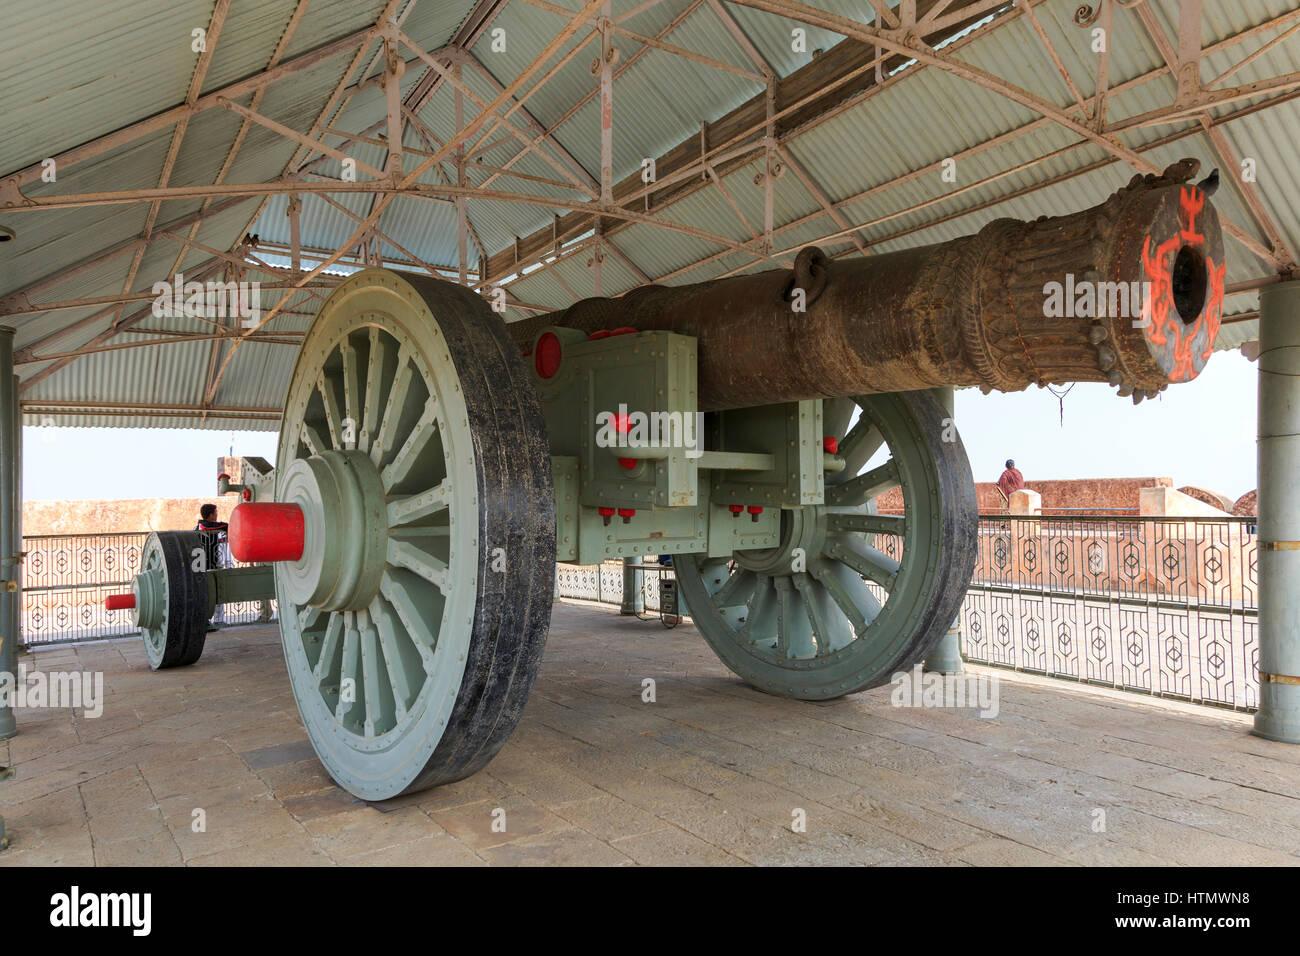 Jaivana cannon, Fort Jaigarh, Jaipur, Rajasthan, India - Stock Image